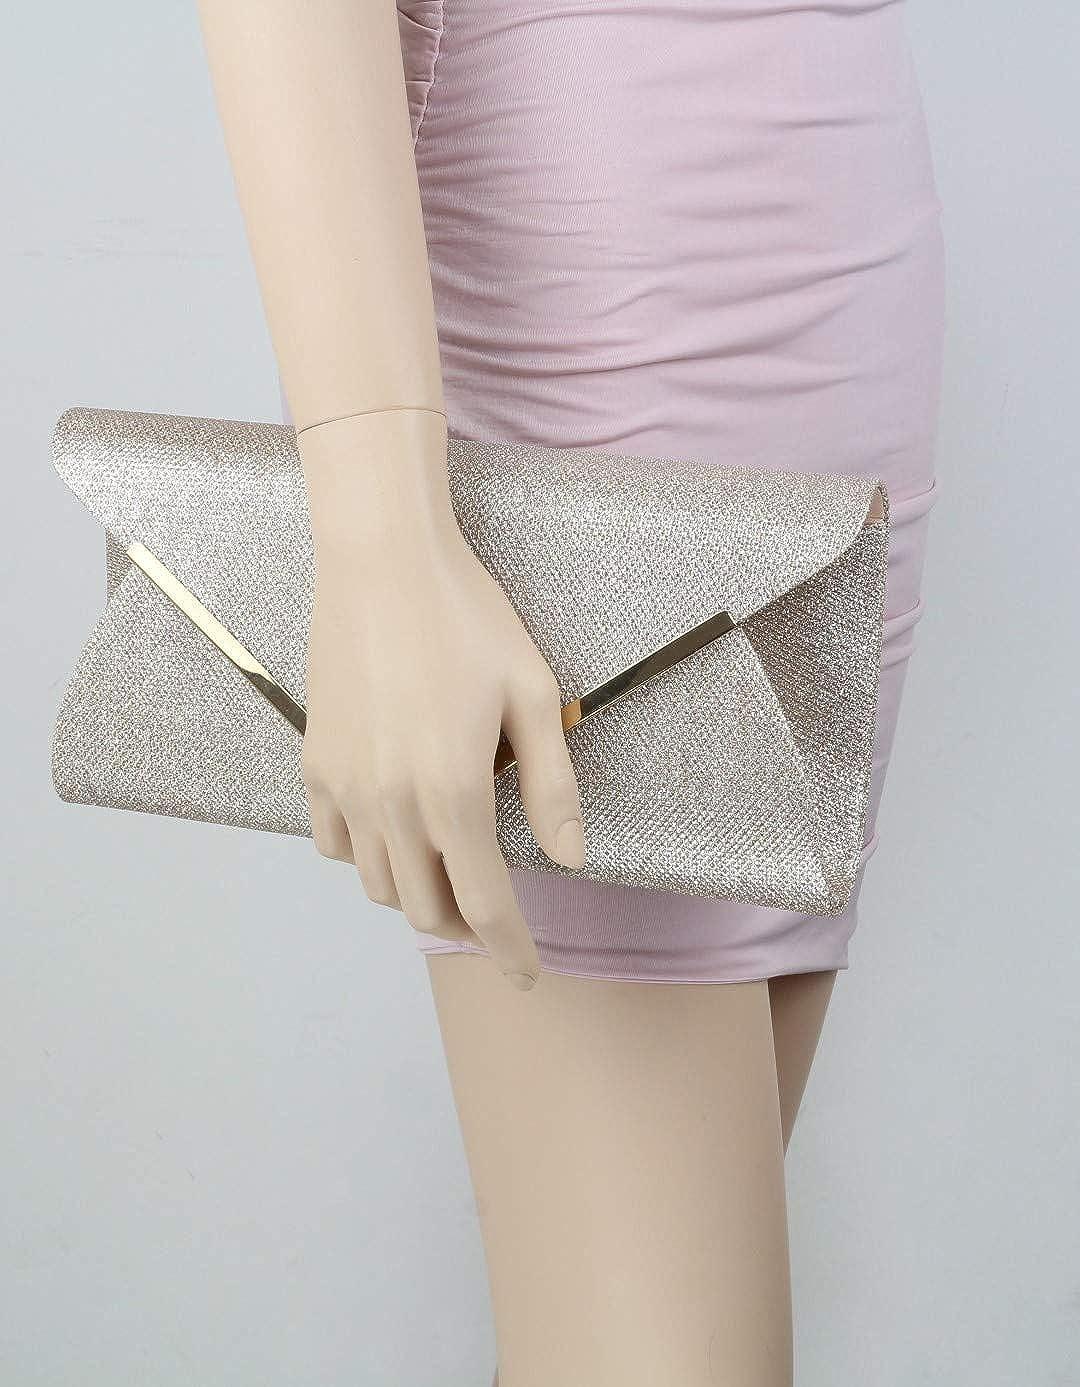 Girly Handbags D 6 cm W 11, H 6, D 2.3 inches Cartera de mano para mujer W 27 H 15